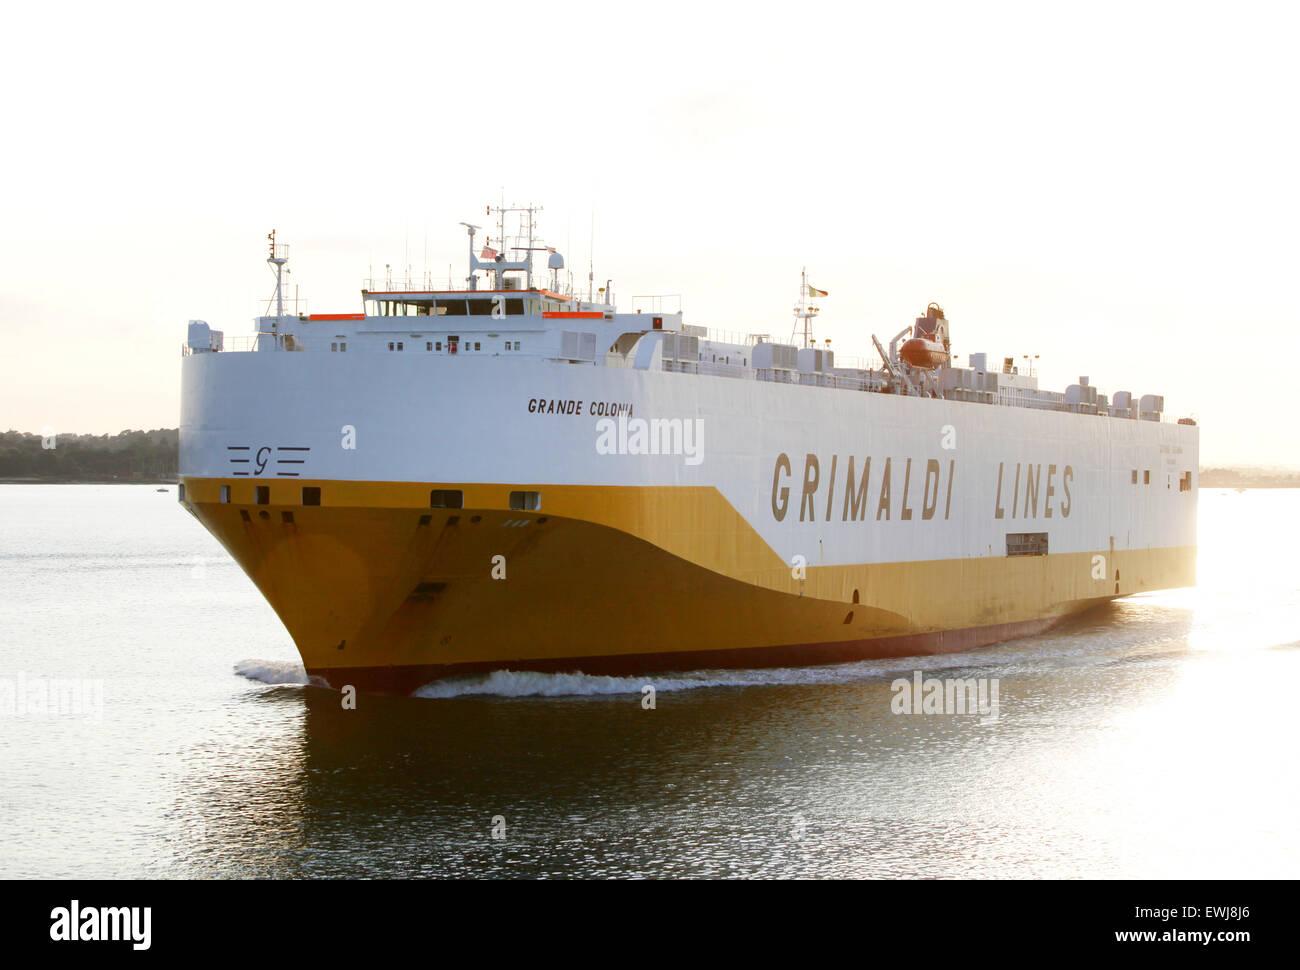 Grimaldi Lines car transporter barco grande colonia foto dejando Southampton Docks Imagen De Stock